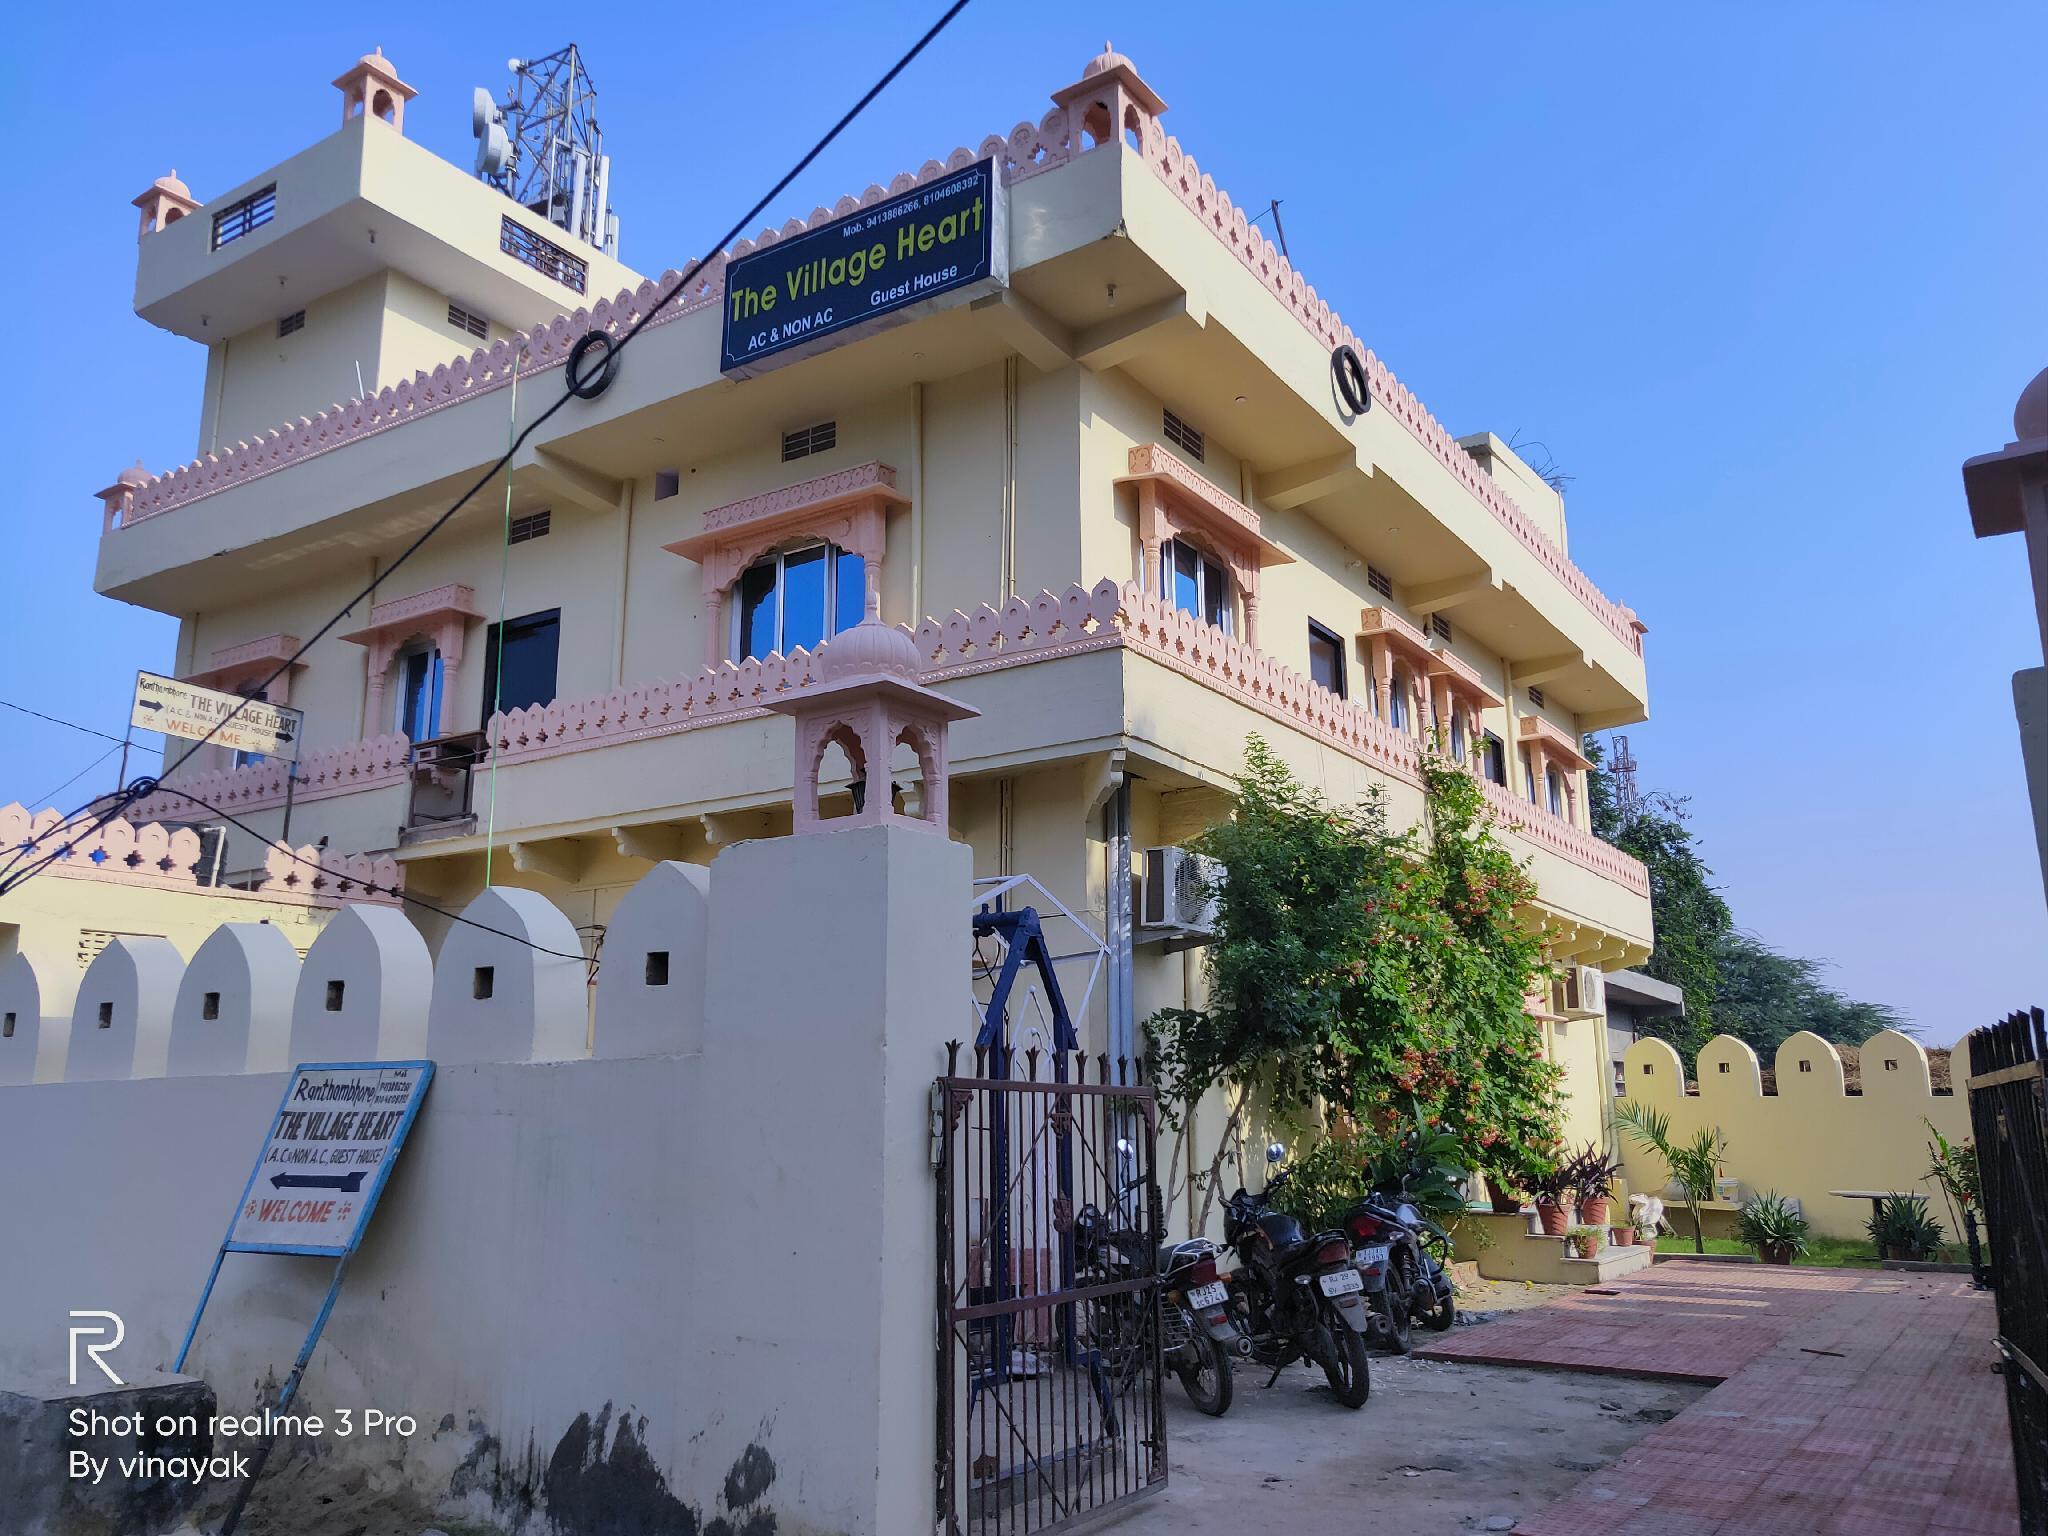 Hotel The Village Heart